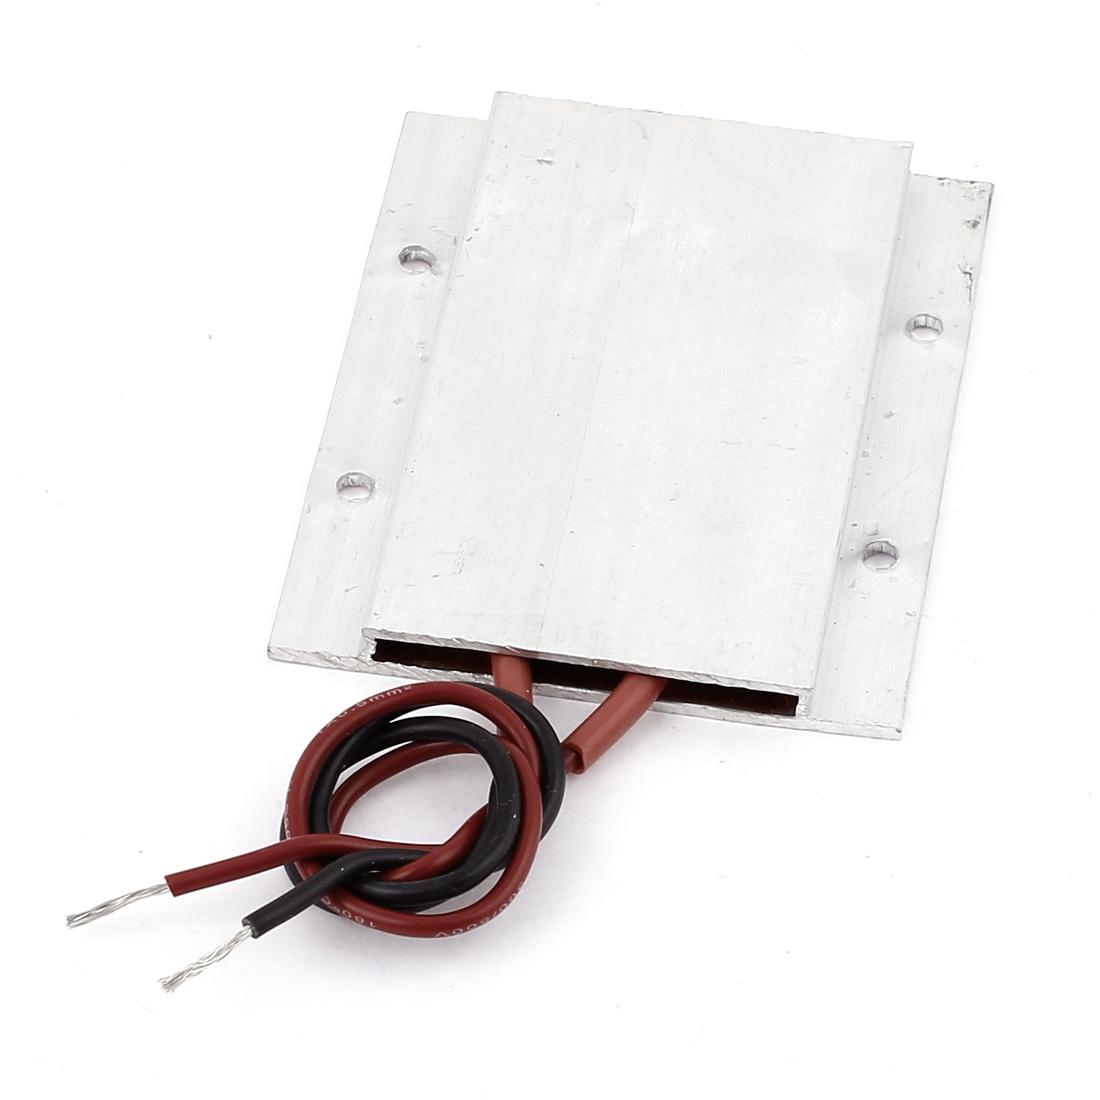 220V 105W 230C Aluminum PTC Heating Element Thermostat Heater Plate